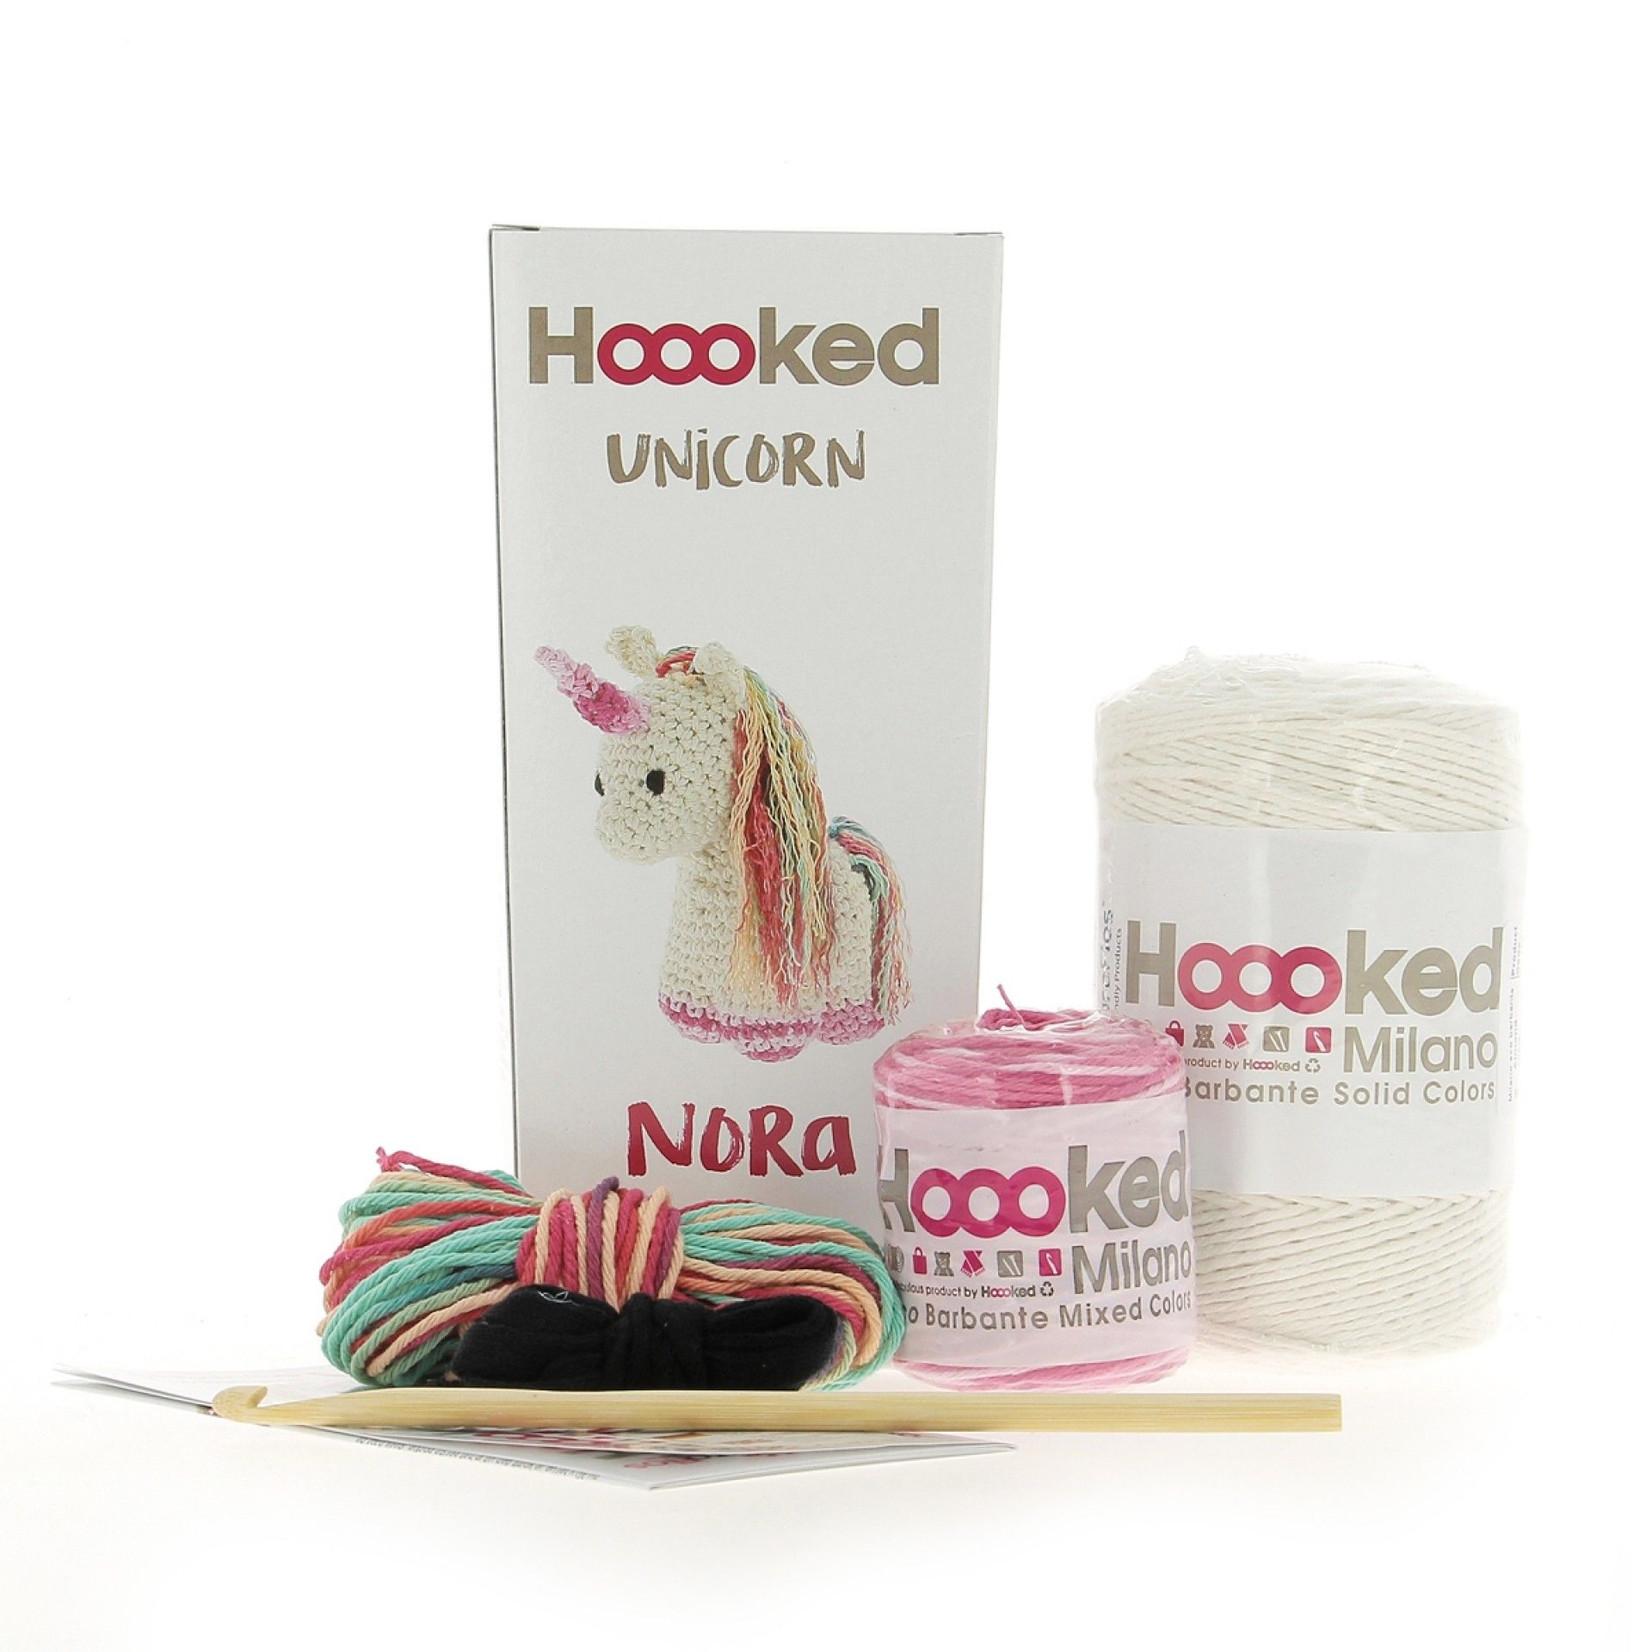 Hoooked Hoooked Amigurumi DIY Haakpakket Eenhoorn Nora Eco Barbante